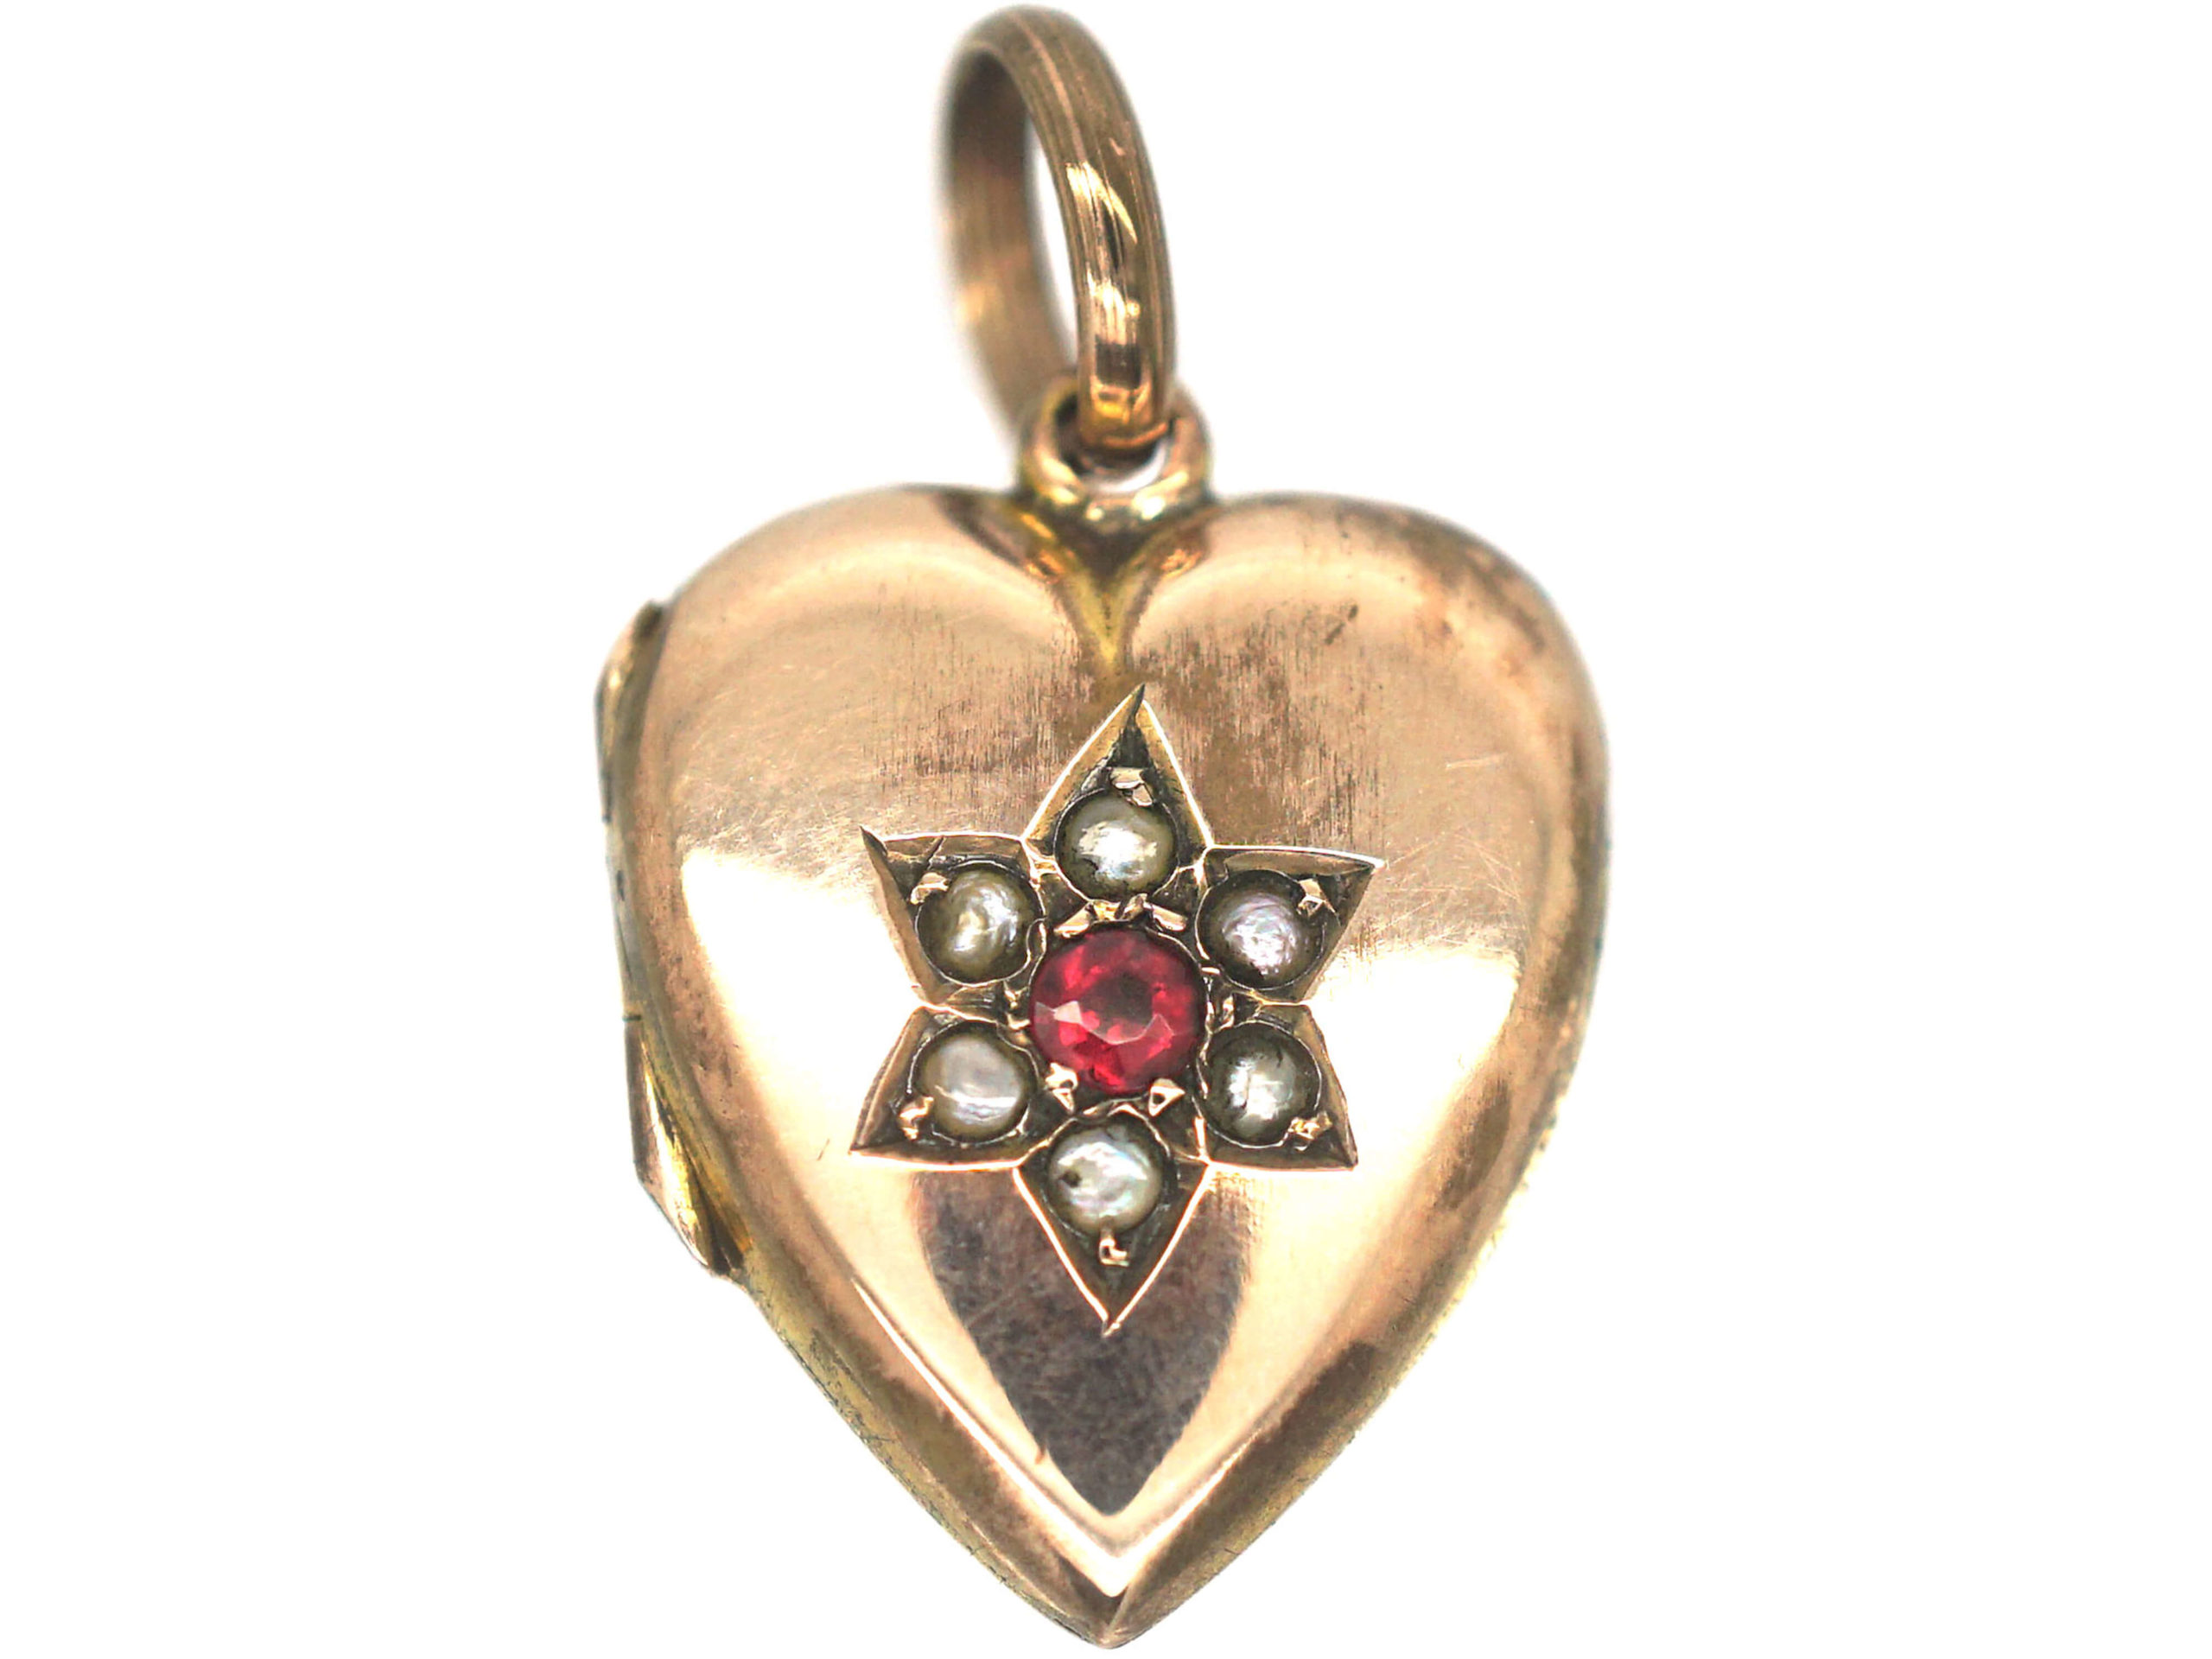 Edwardian 9ct Back & Front Heart Shaped Locket set with a Garnet & Natural Split Pearls